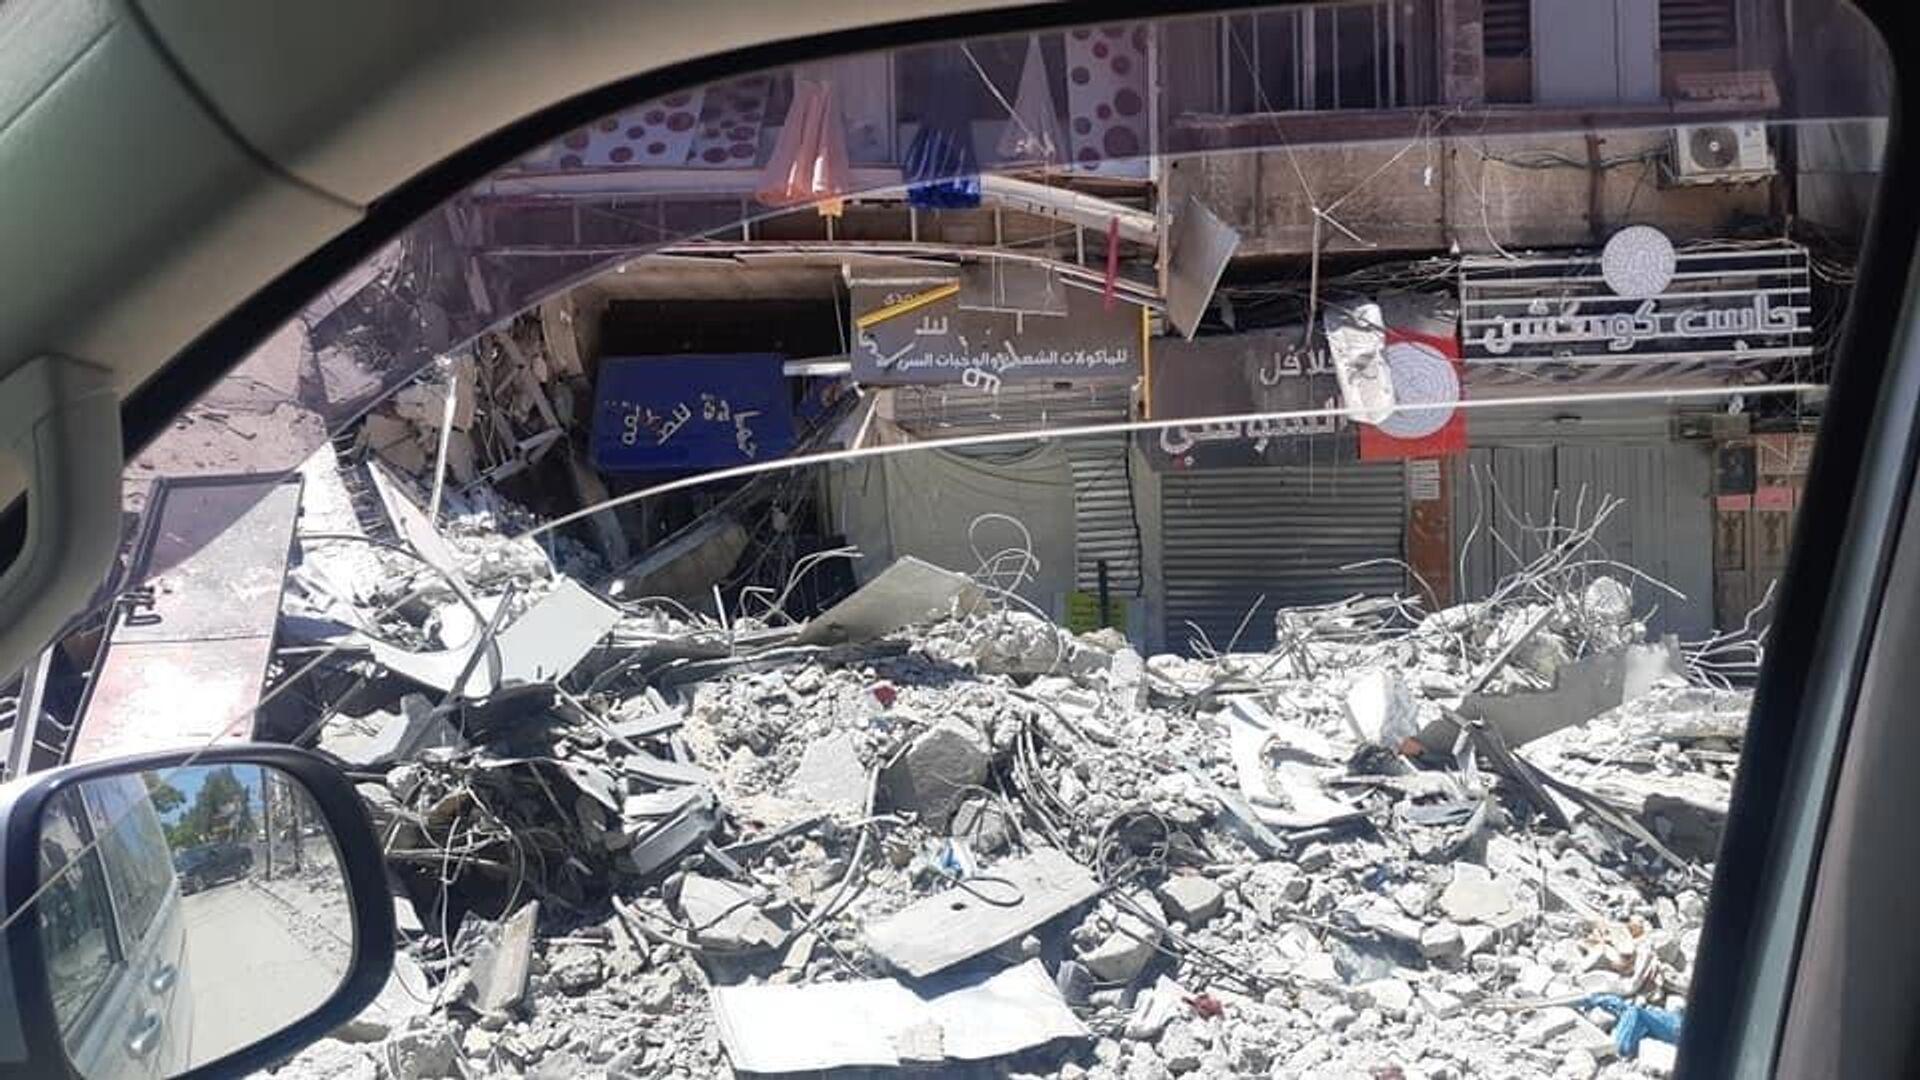 Una situazione drammatica a Gaza dopo una nuova escalation di violenza tra israeliani e palestinesi - Sputnik Italia, 1920, 19.05.2021